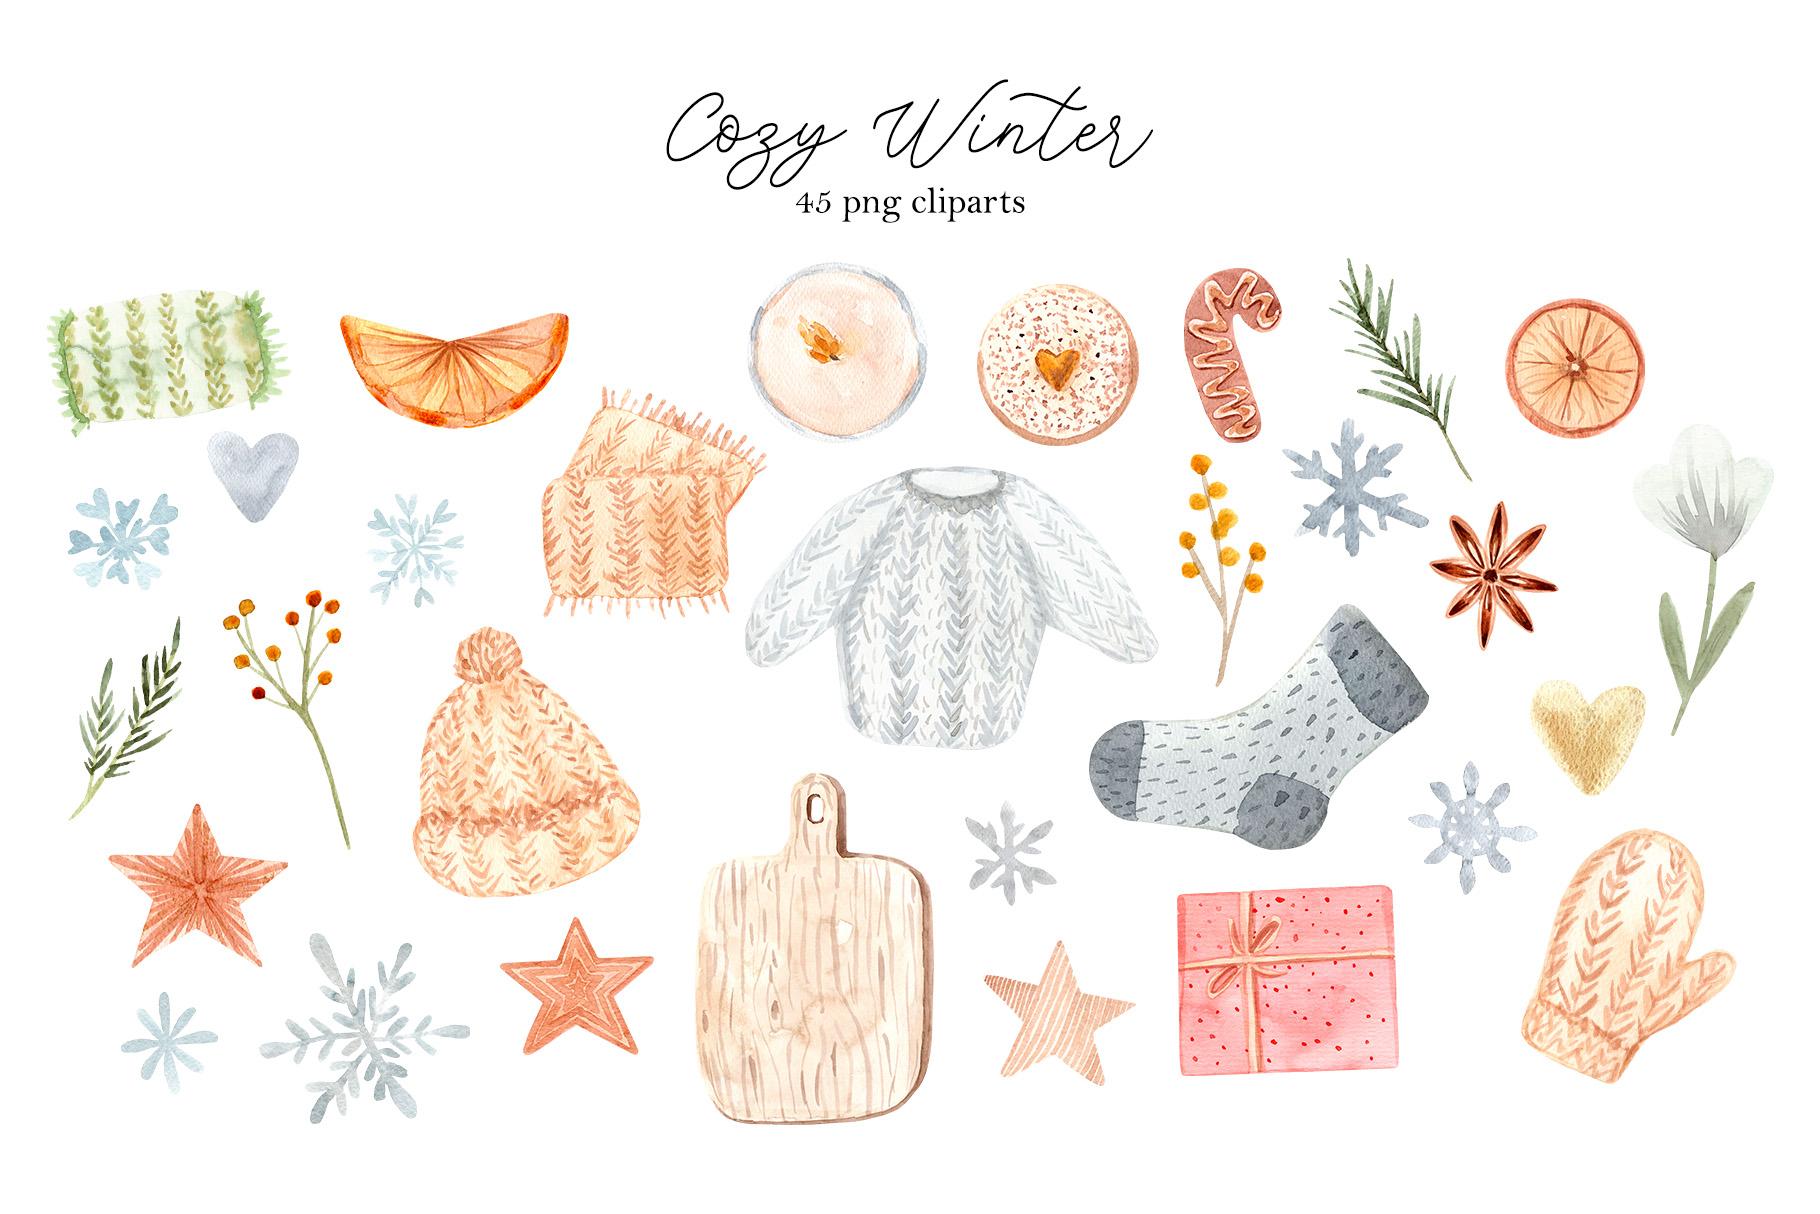 Watercolor Cozy Winter Collection example image 2